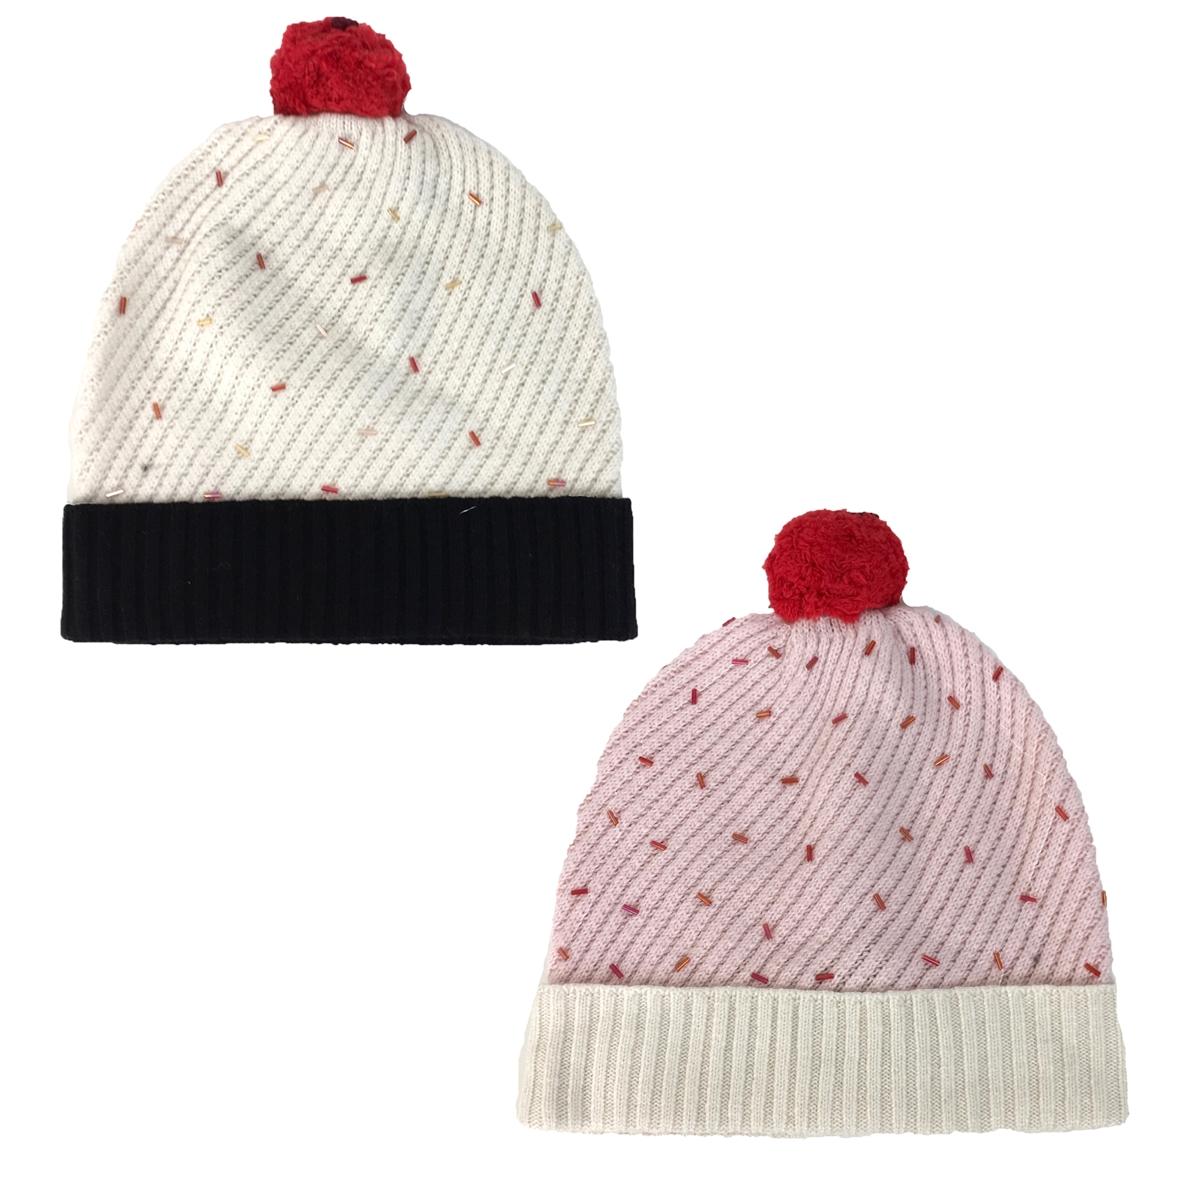 7870c89bd2c Kate Spade Cupcake Pom Pom Knit Beanie Hat